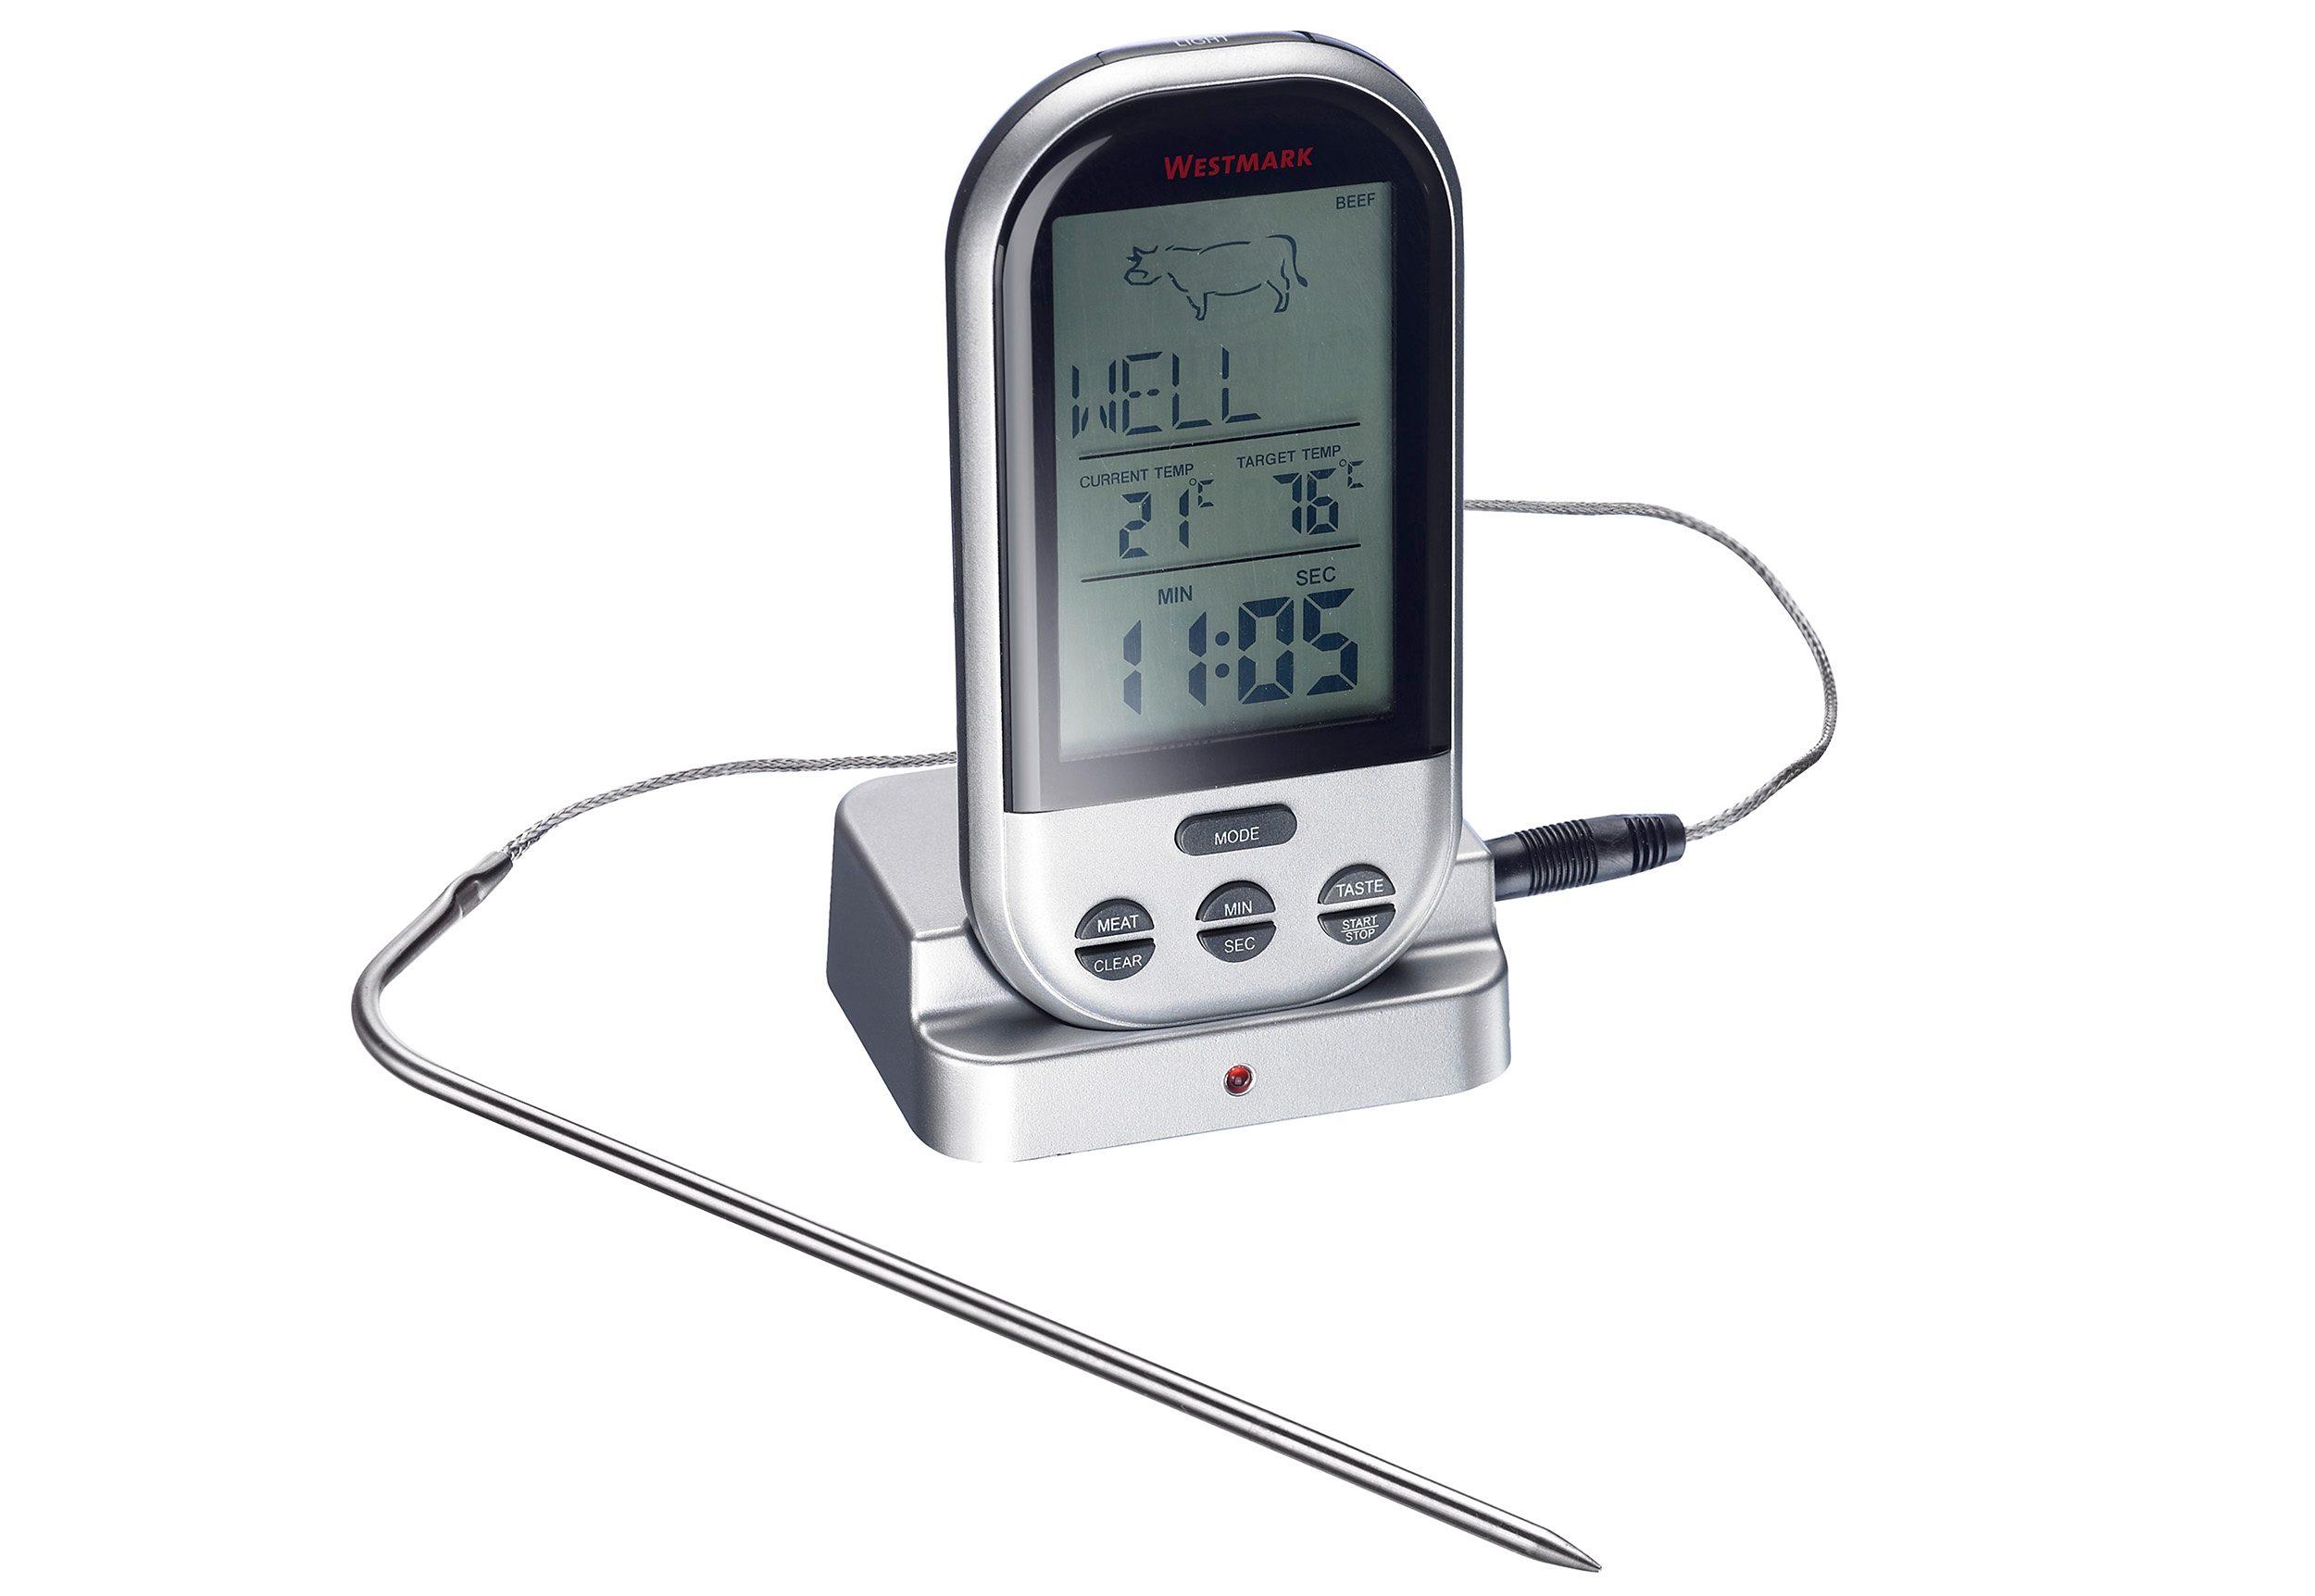 WESTMARK Funk-Bratenthermometer, digital